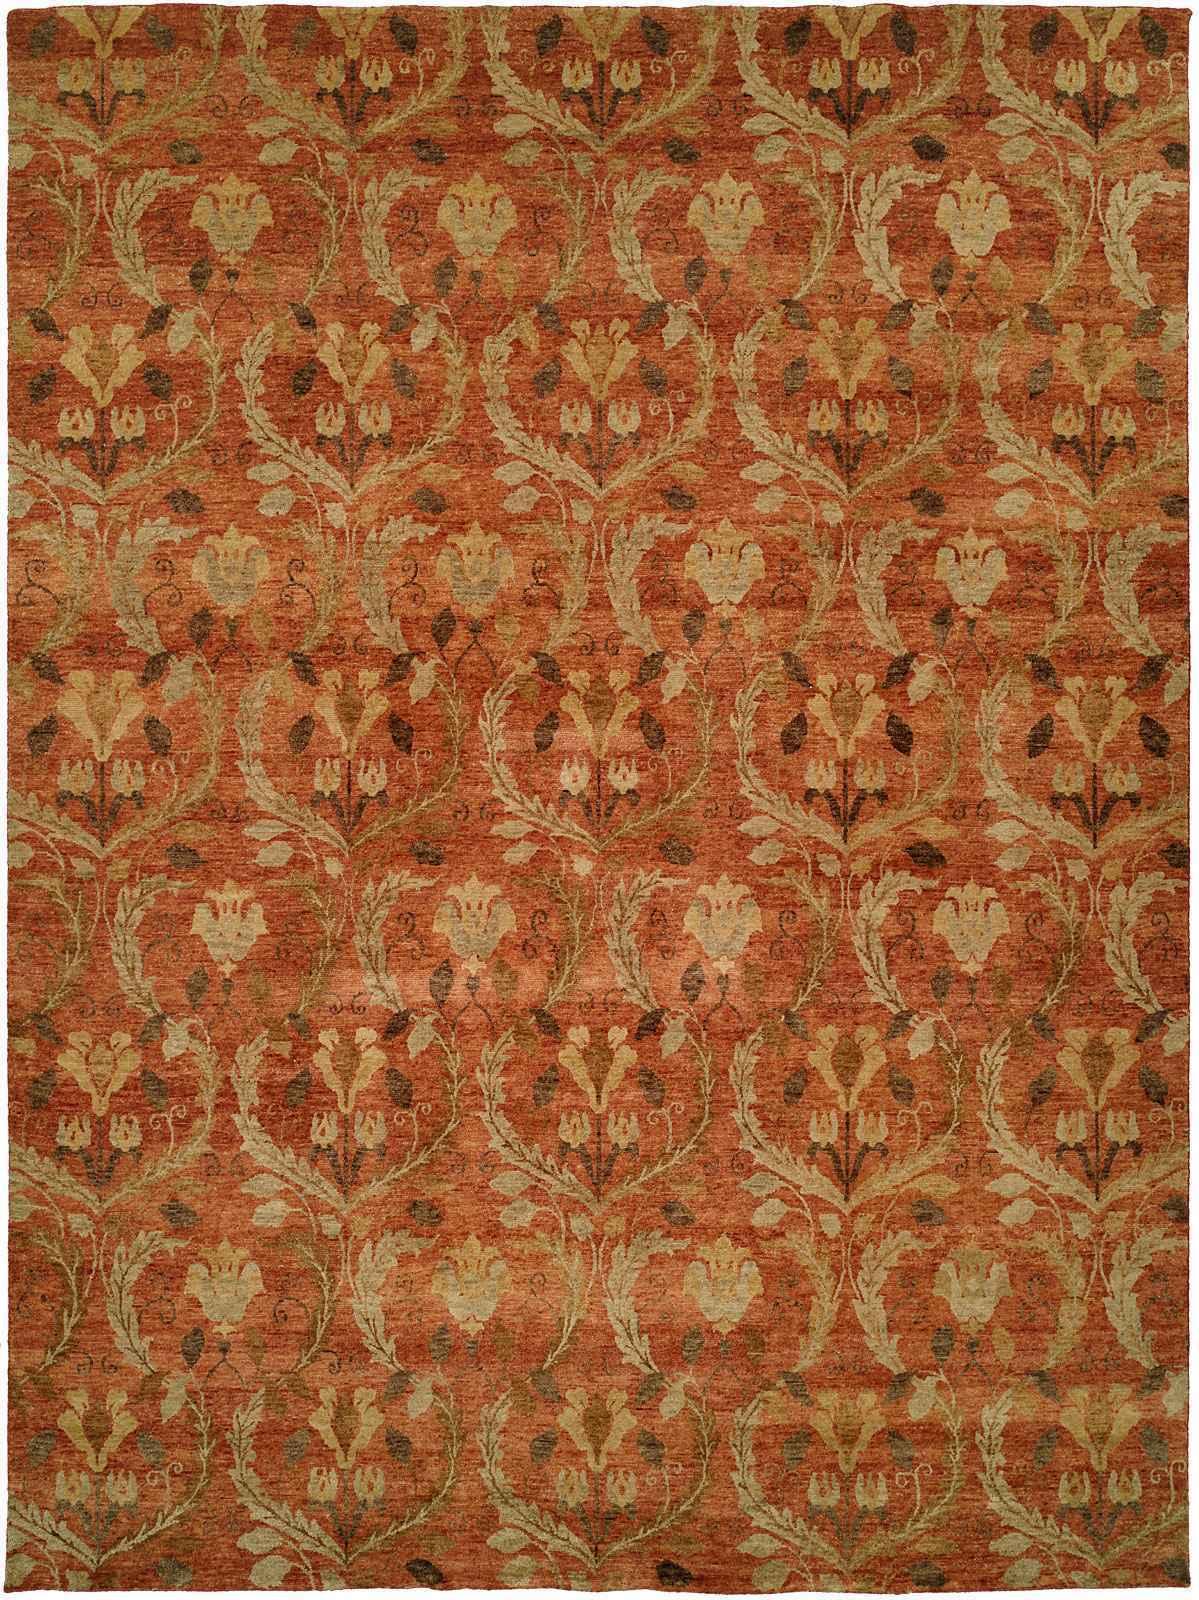 Vermont Oriental Rugs  Sales Cleaning Repair Appraisals  Vincent J Fernandez